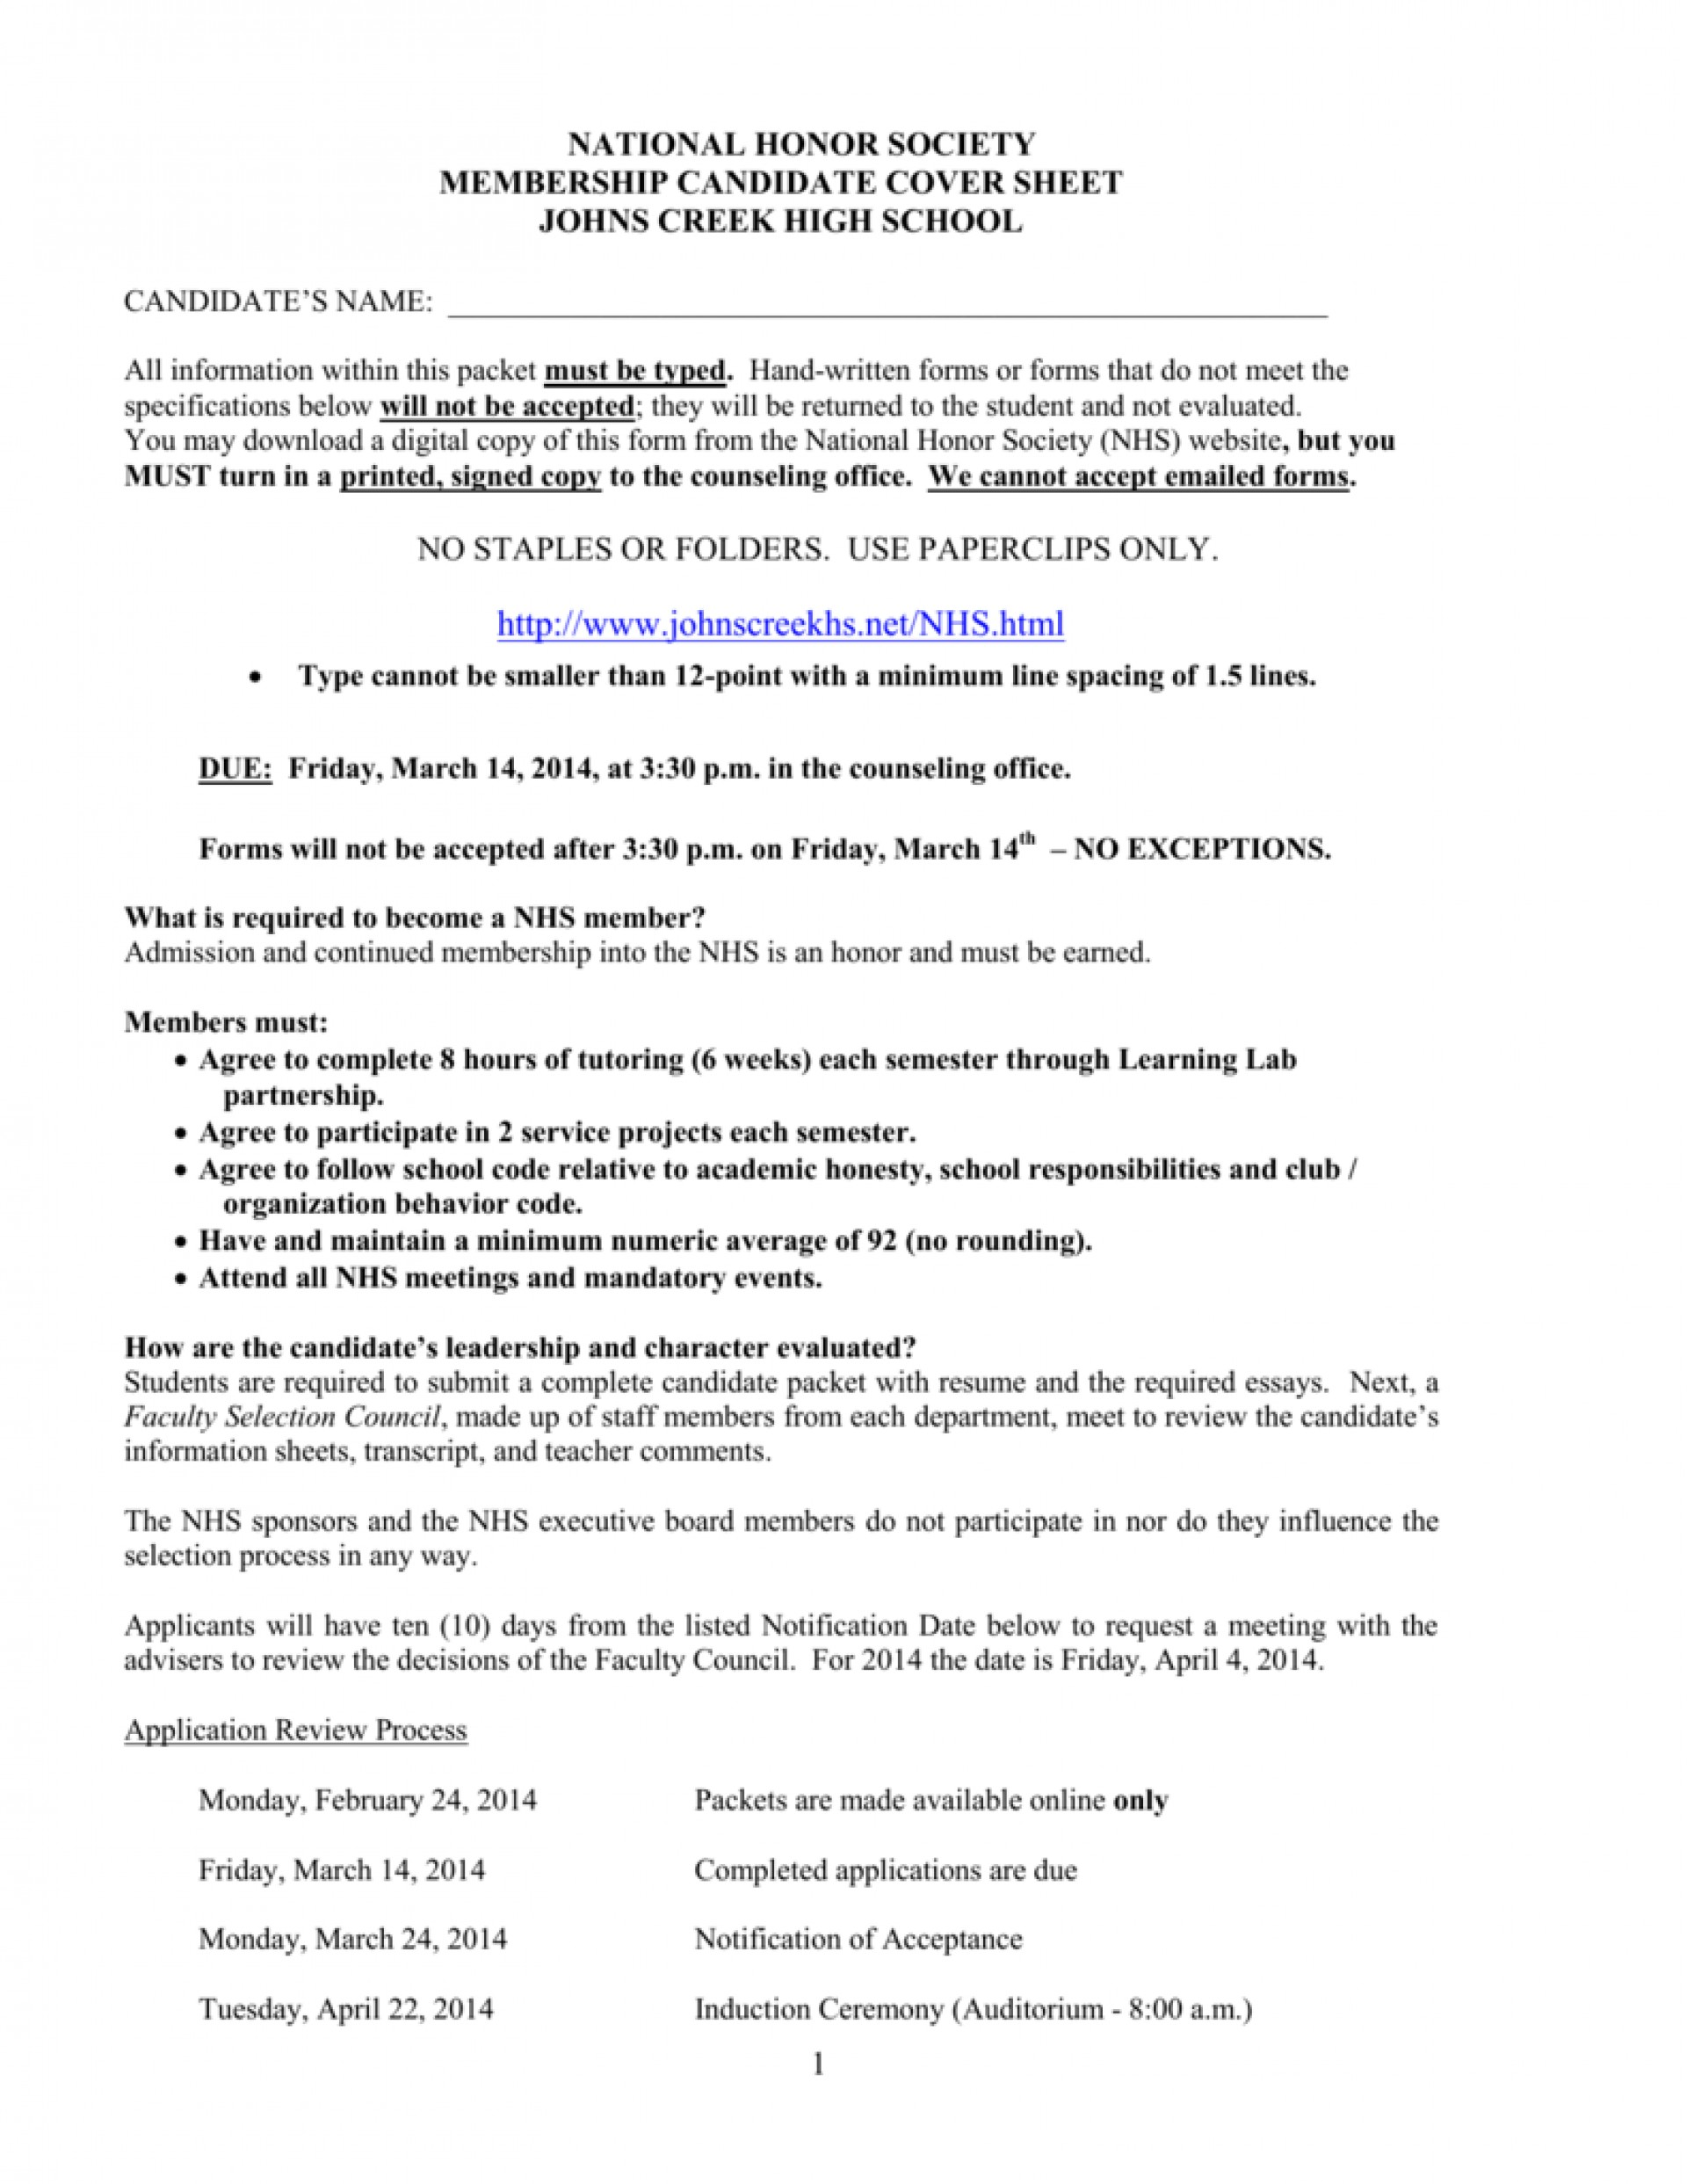 015 National Honor Society Application Essay 008823851 1 Sensational Examples Service Junior Scholarship 1920